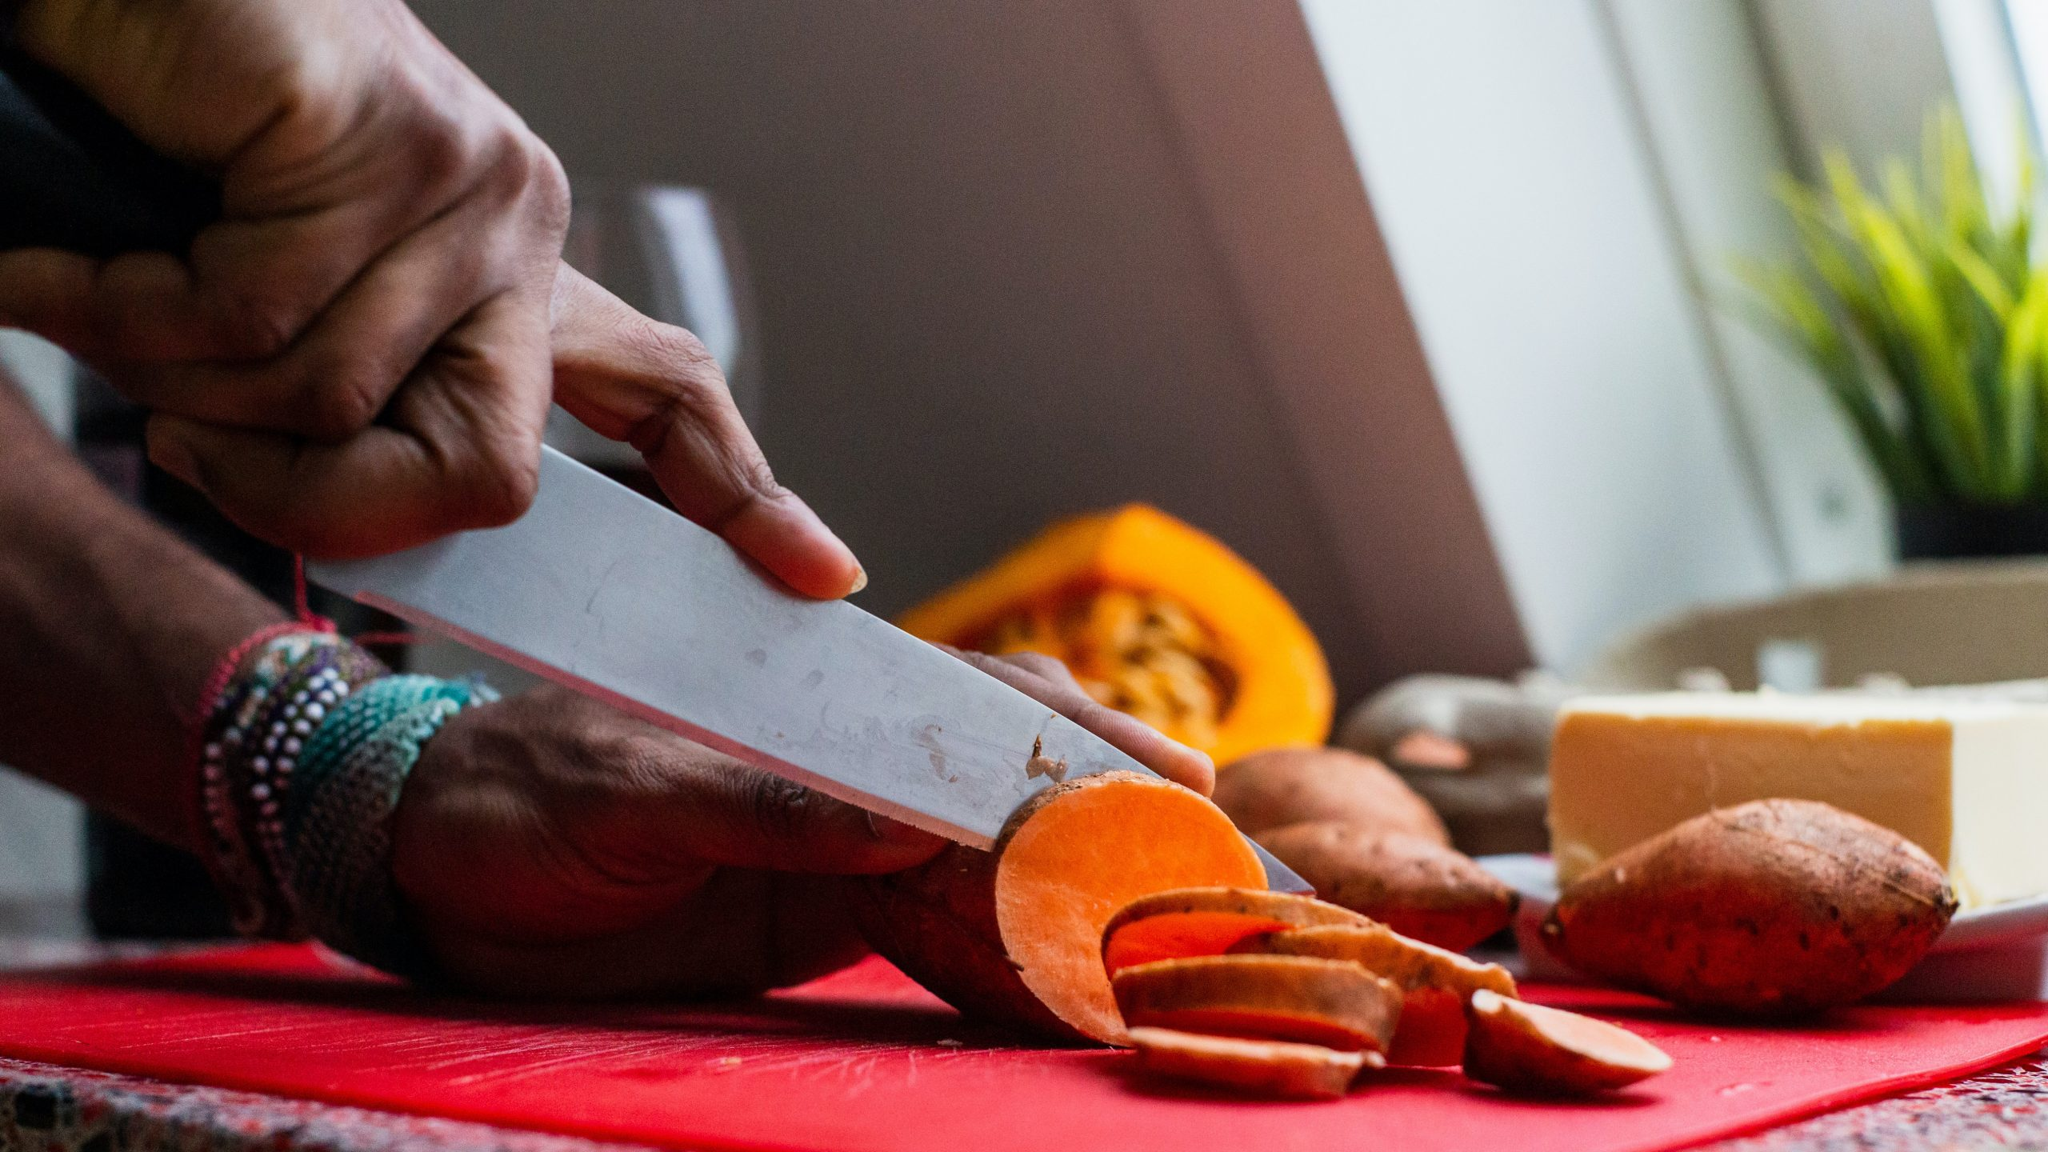 Hand slicing a sweetpotato